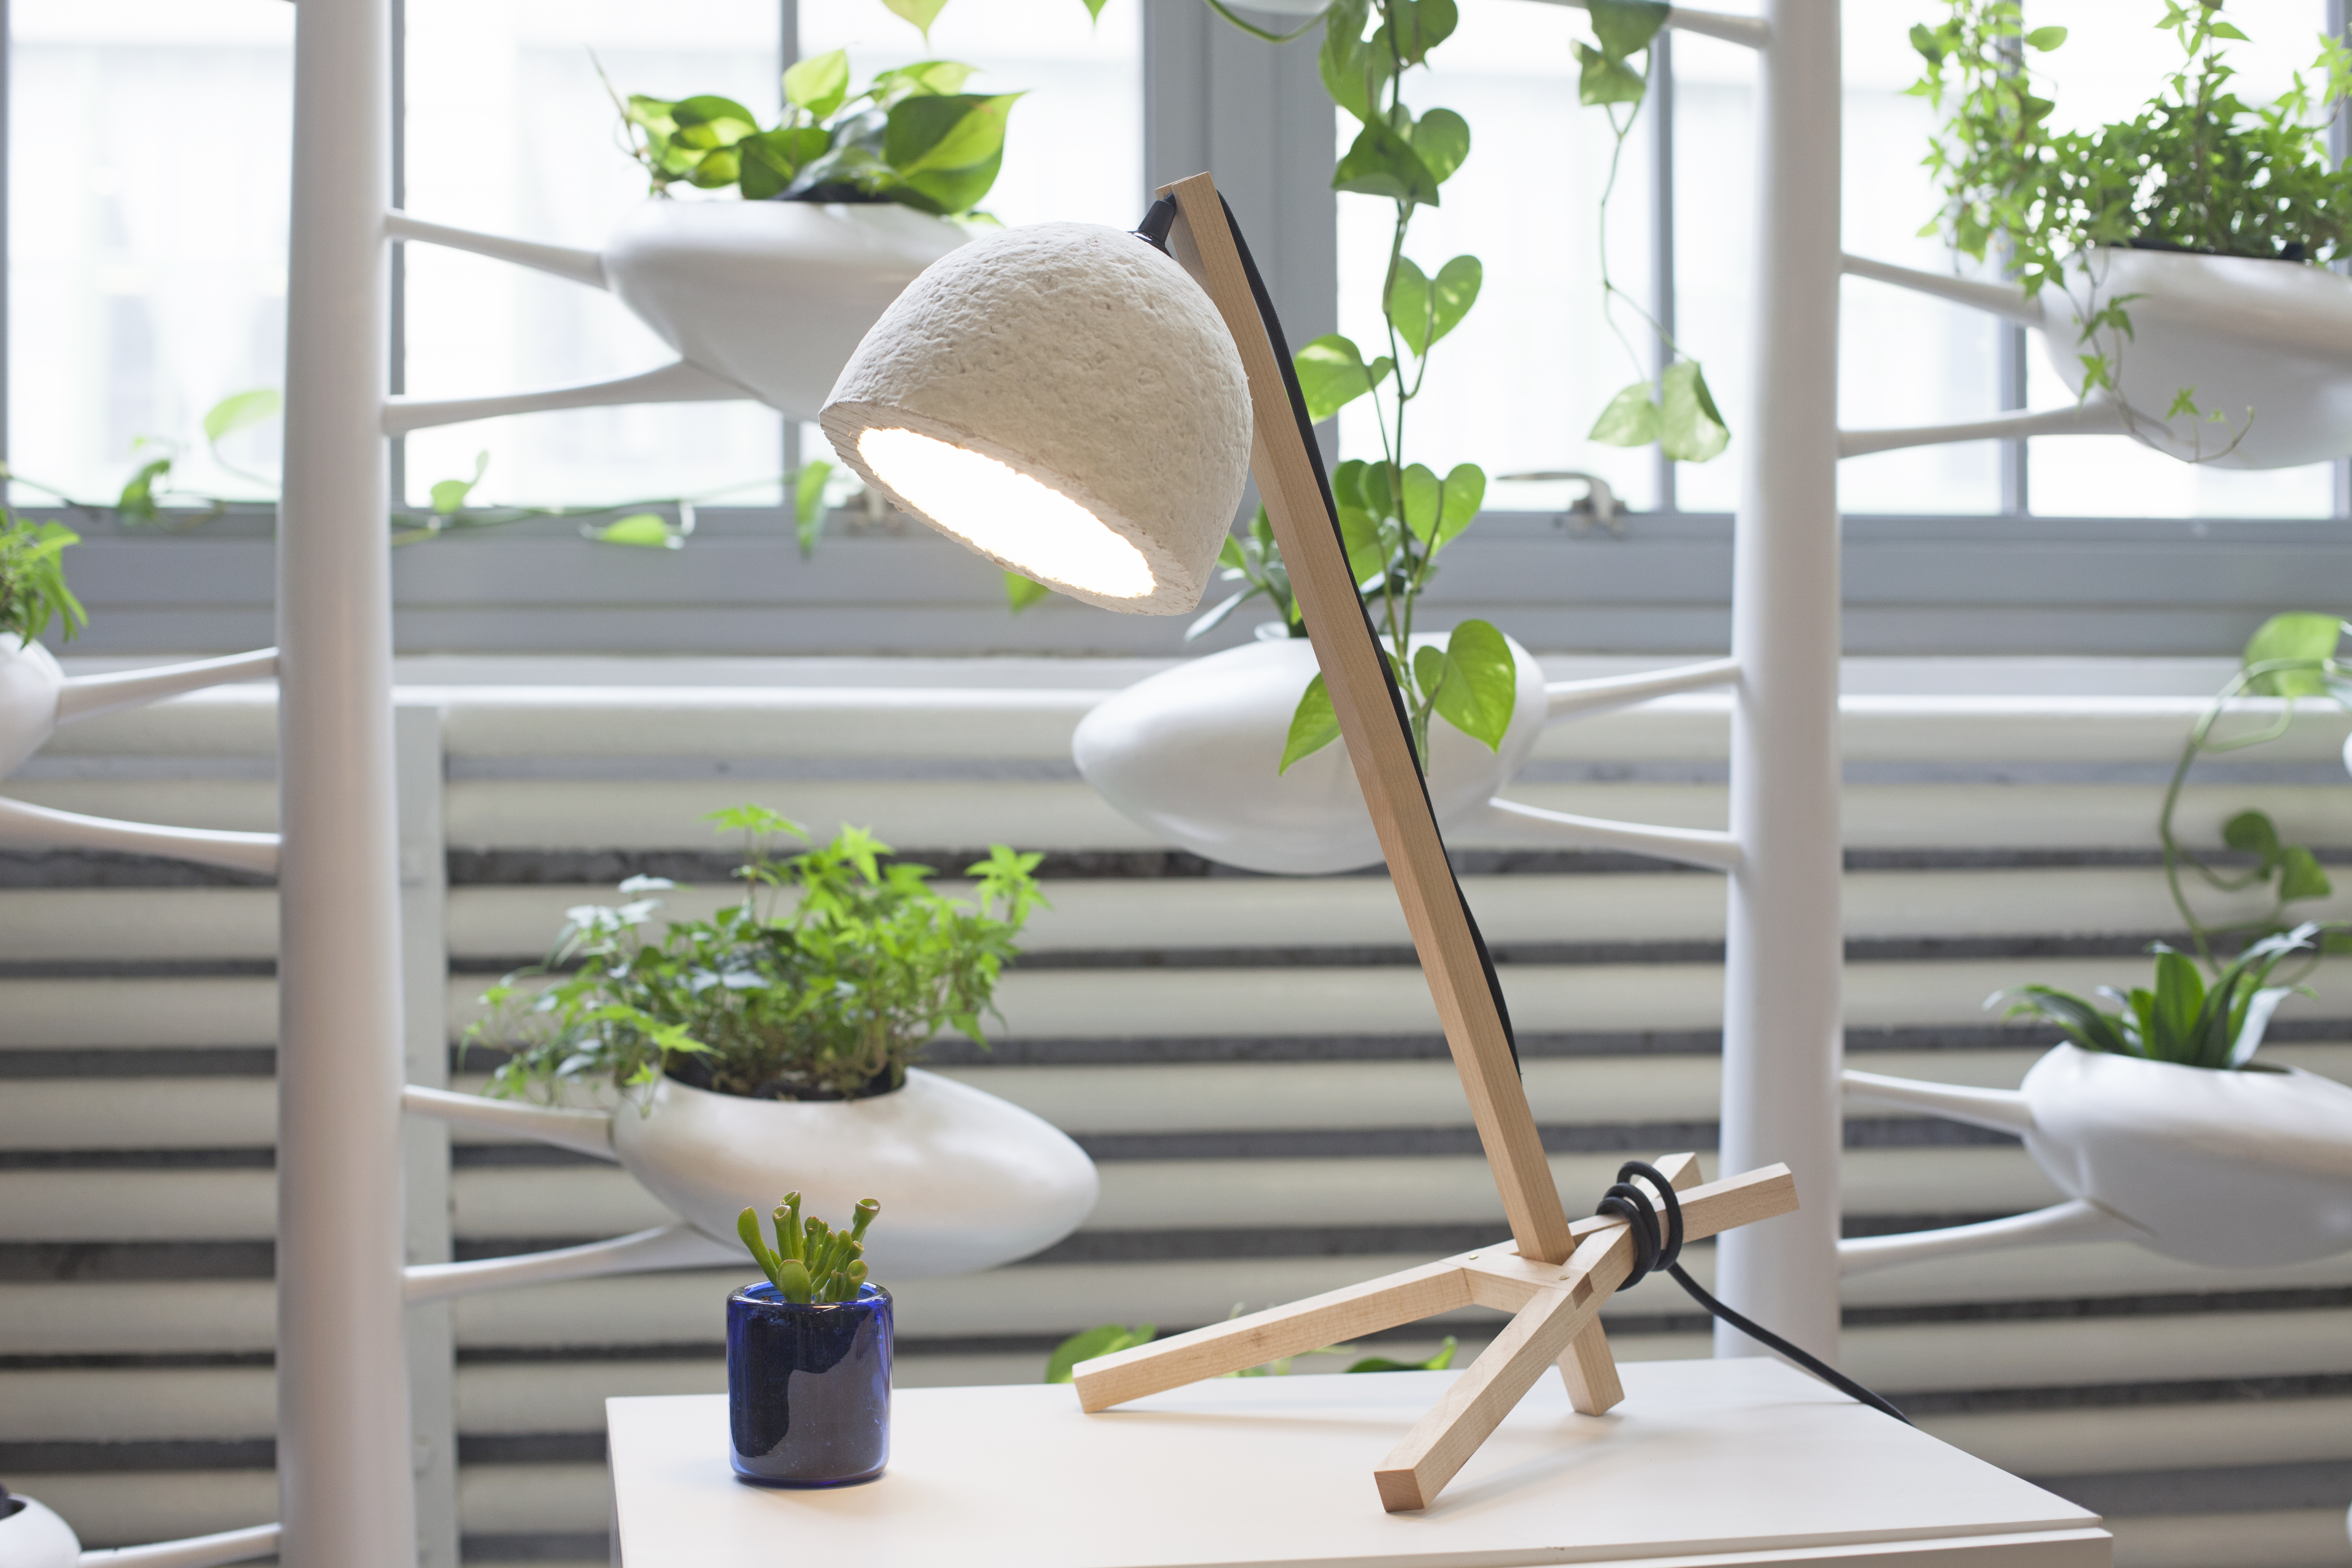 ecovative design collaborating with danielle trofe design to